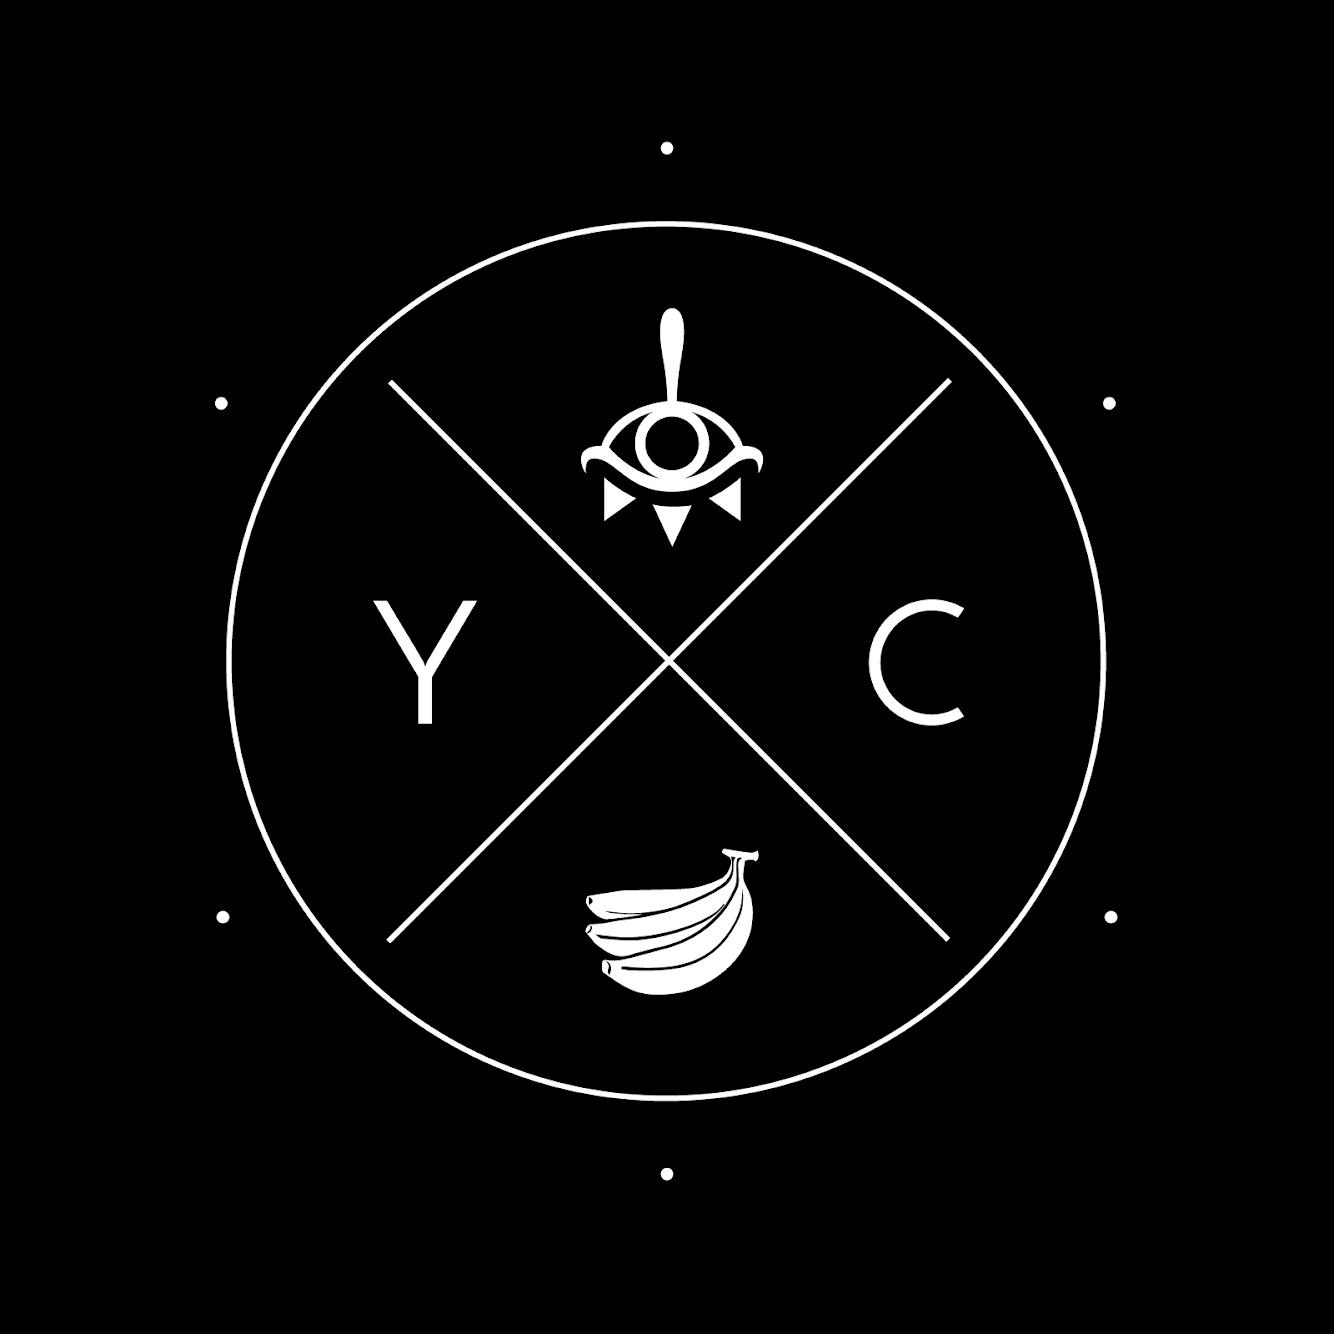 Yiga clan hipster logo, design 2 Hipster logo, Yiga clan